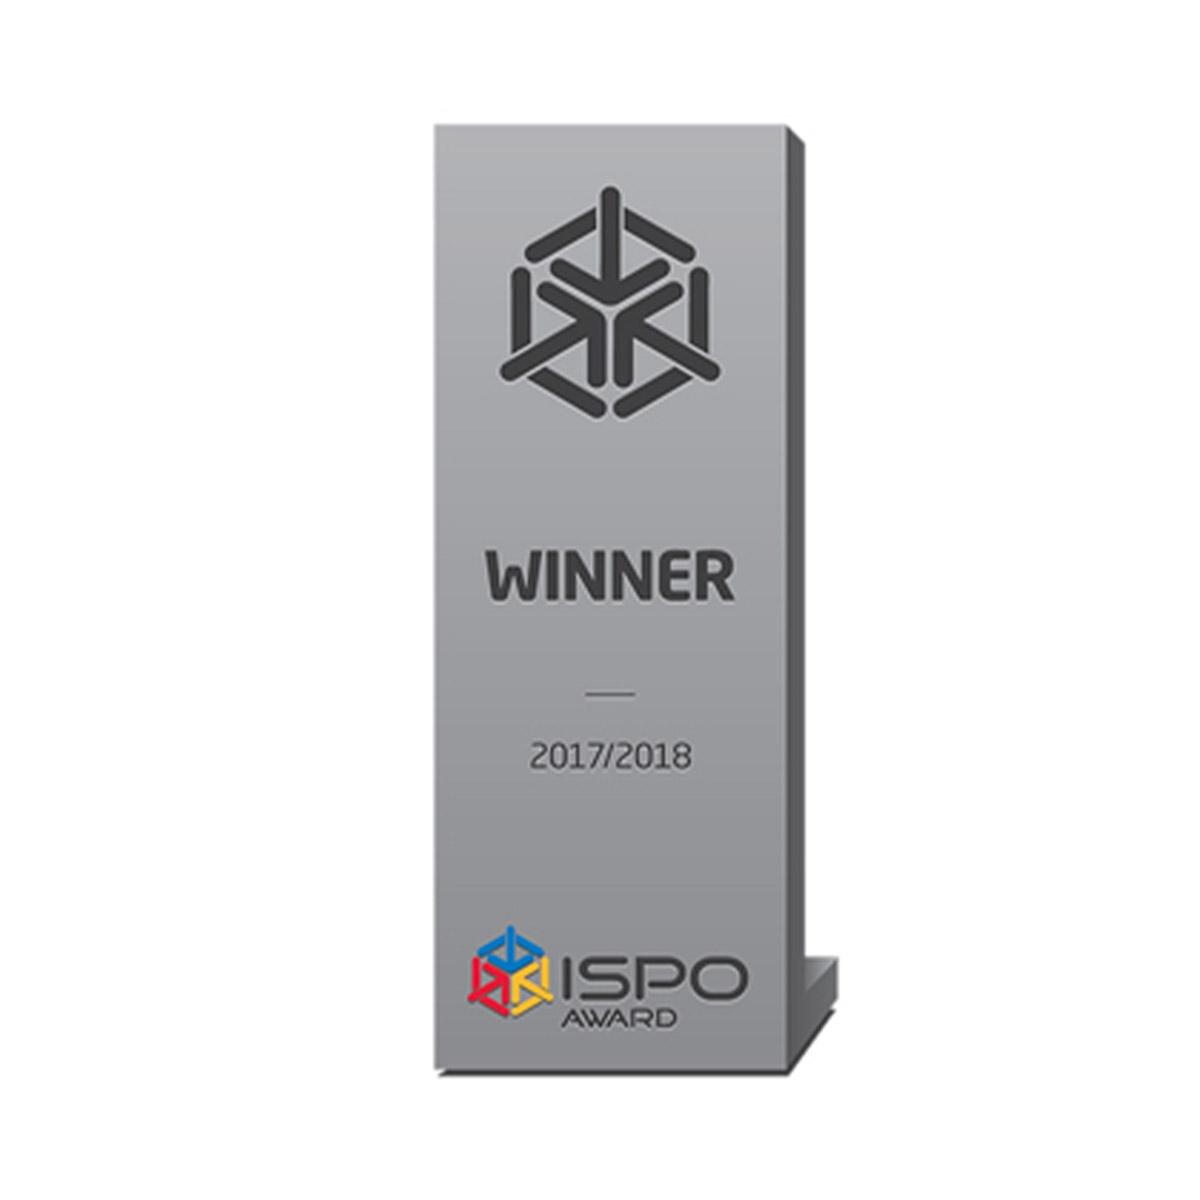 cafflano-klassic-award-4